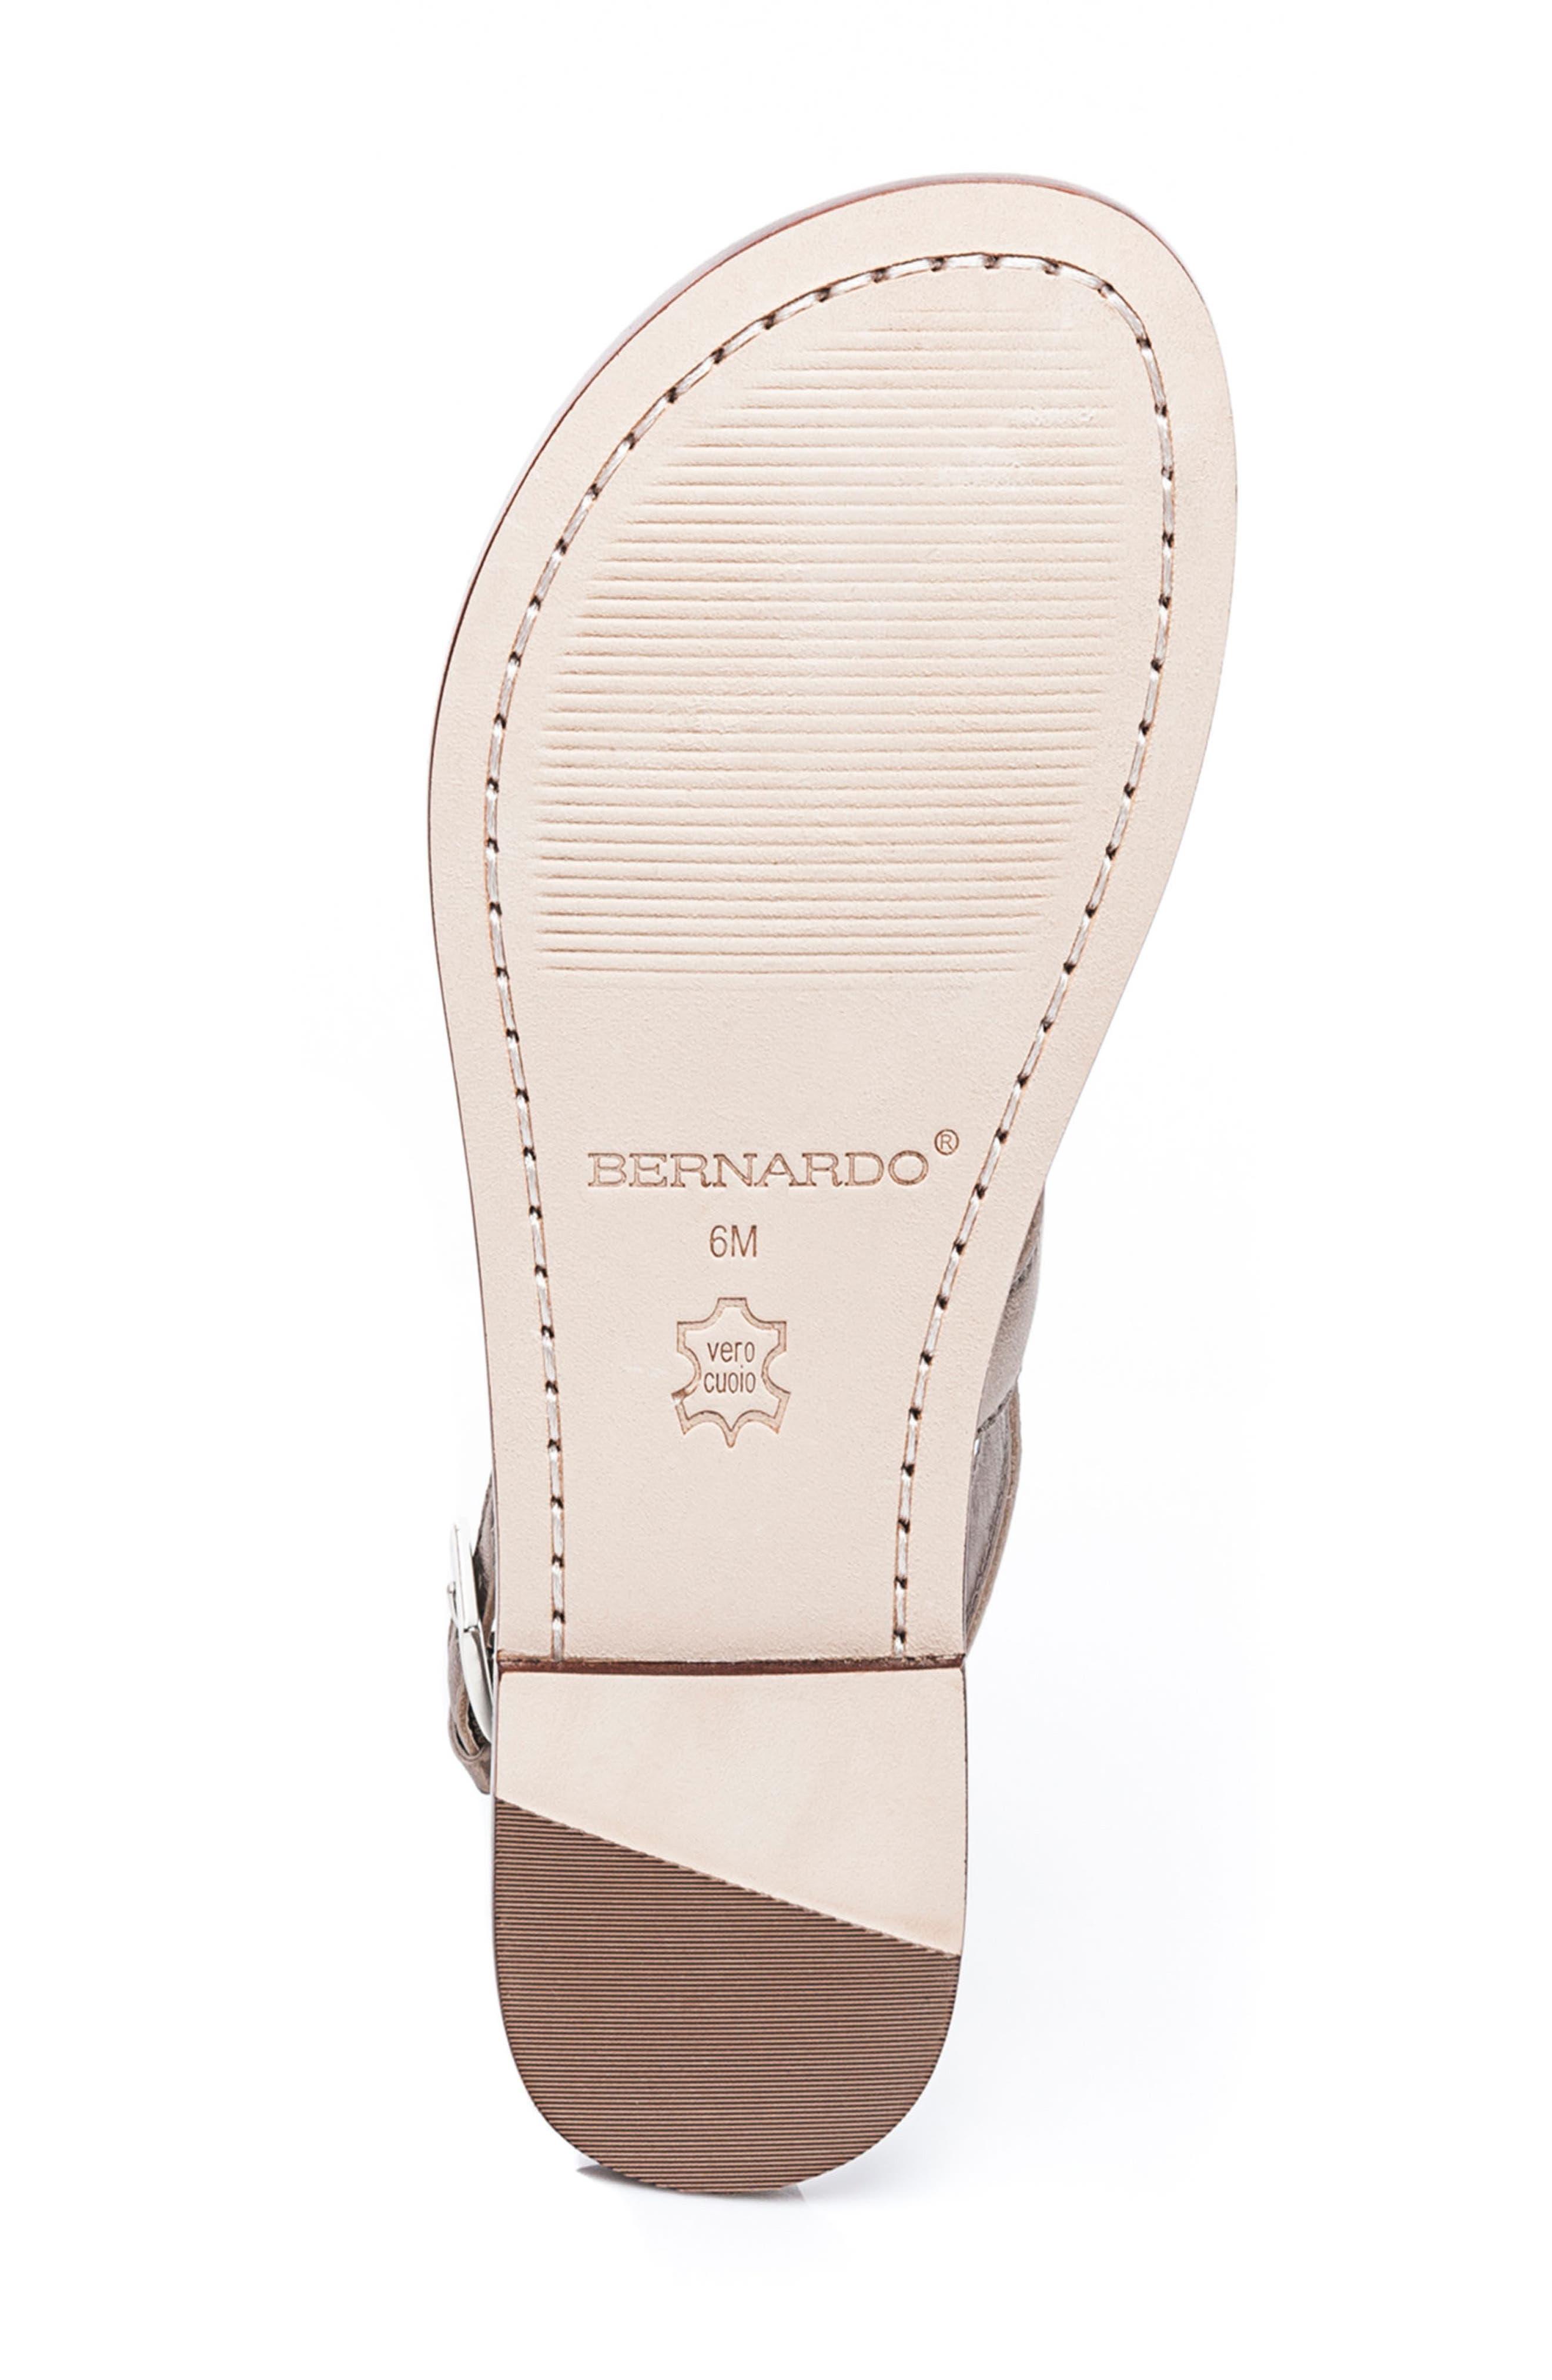 Bernardo Maverick Leather Sandal,                             Alternate thumbnail 6, color,                             Platinum Leather